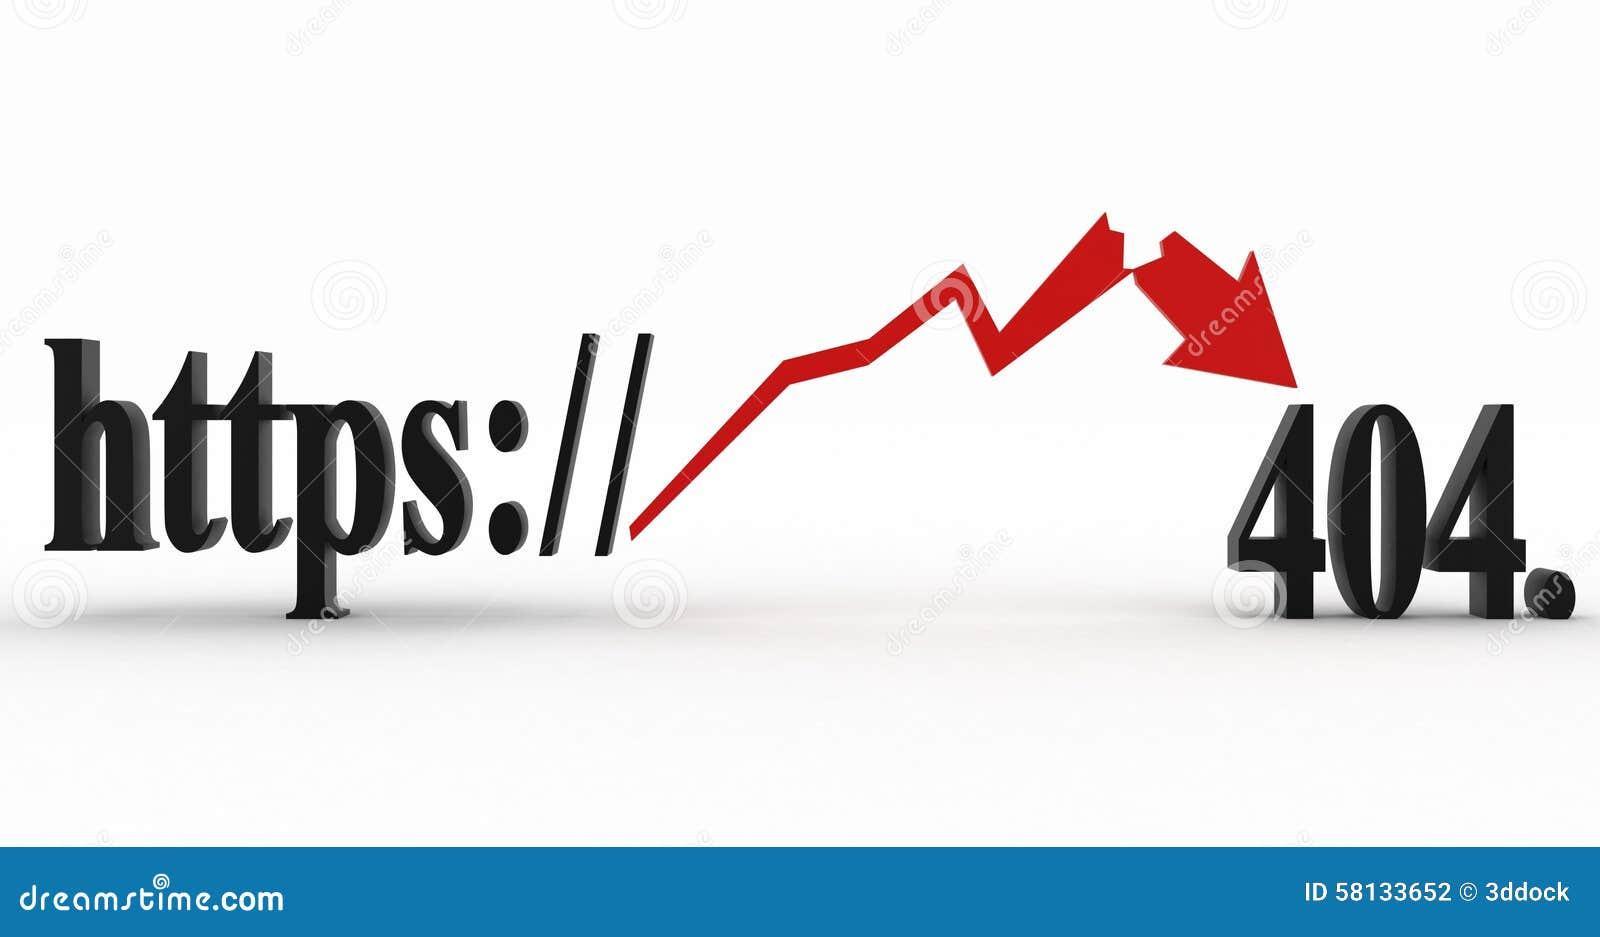 HTTP Not Found Error Code 404 Stock Illustration - Illustration of